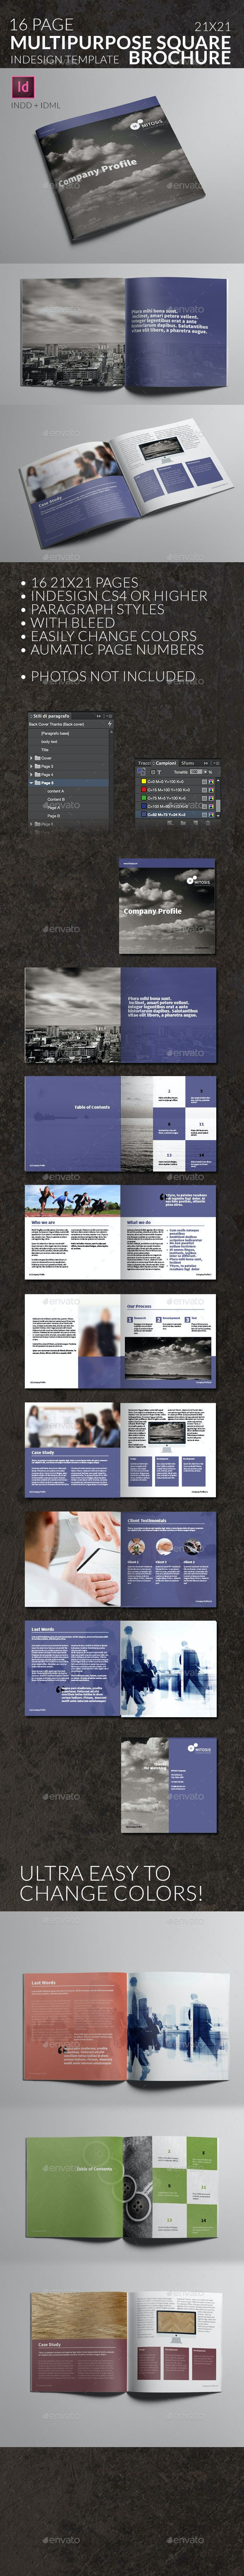 Corporate Square Brochure - Mitosis - Multipurpose - Corporate Brochures